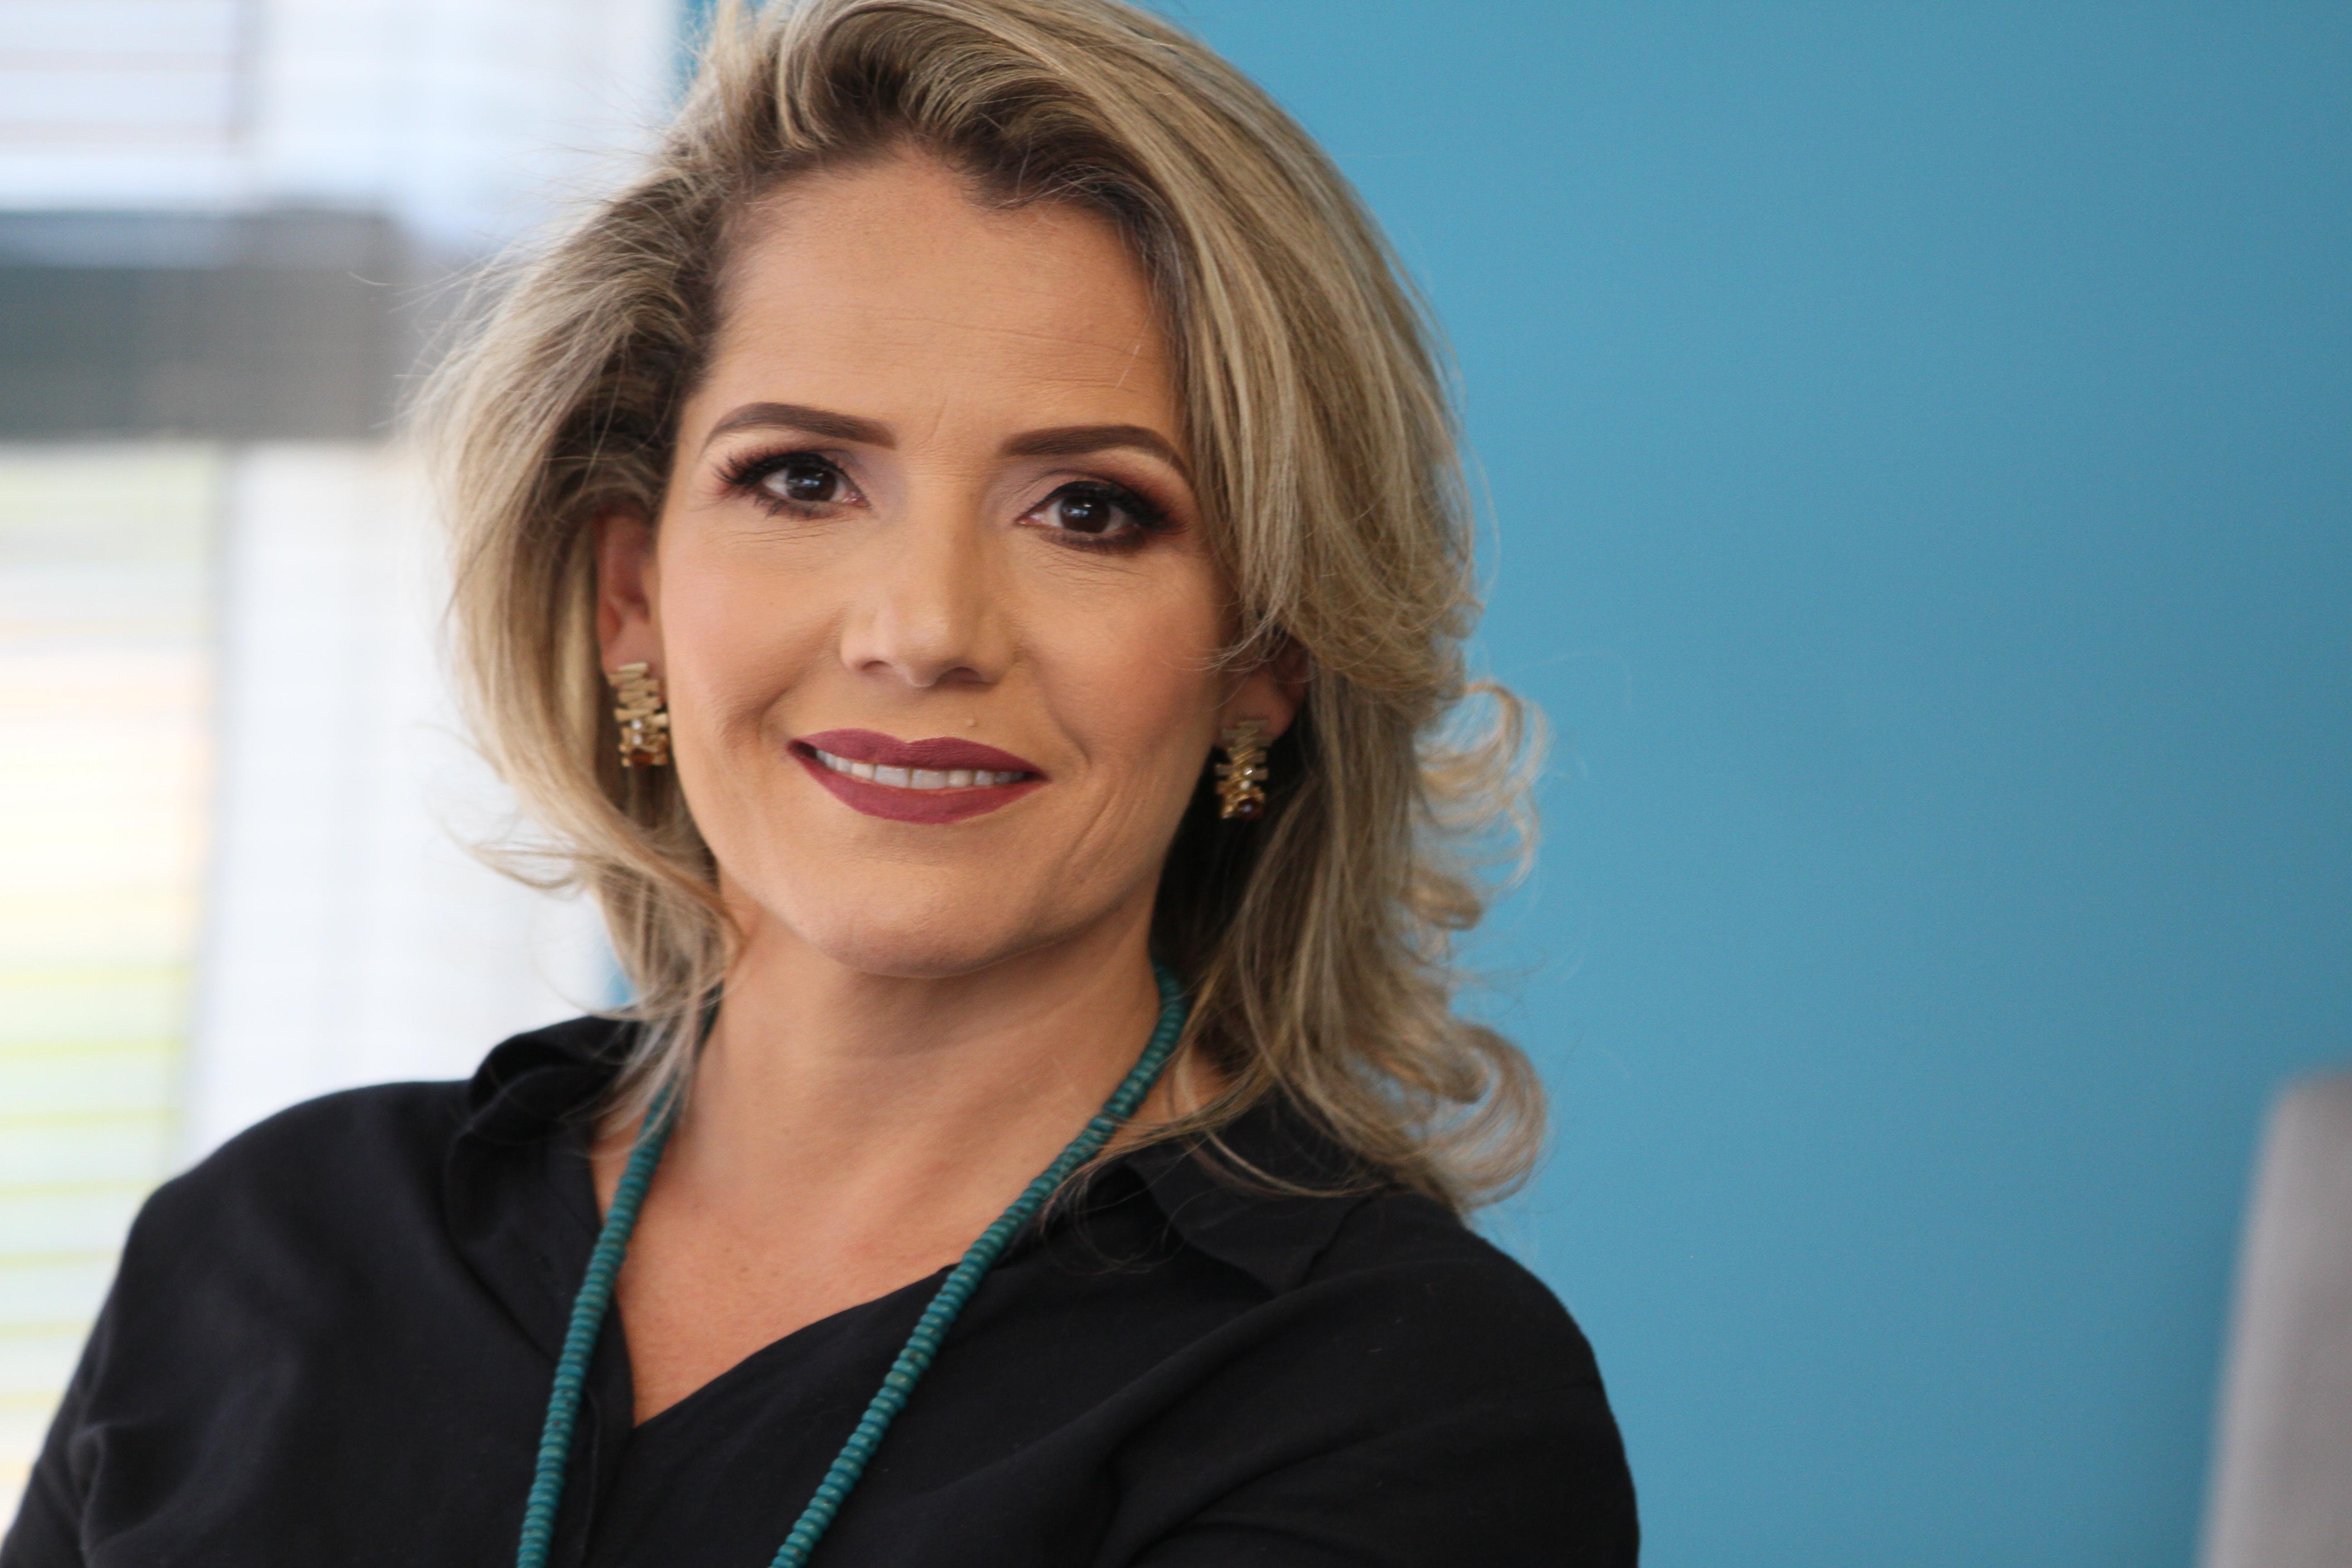 Alessandra Fonseca